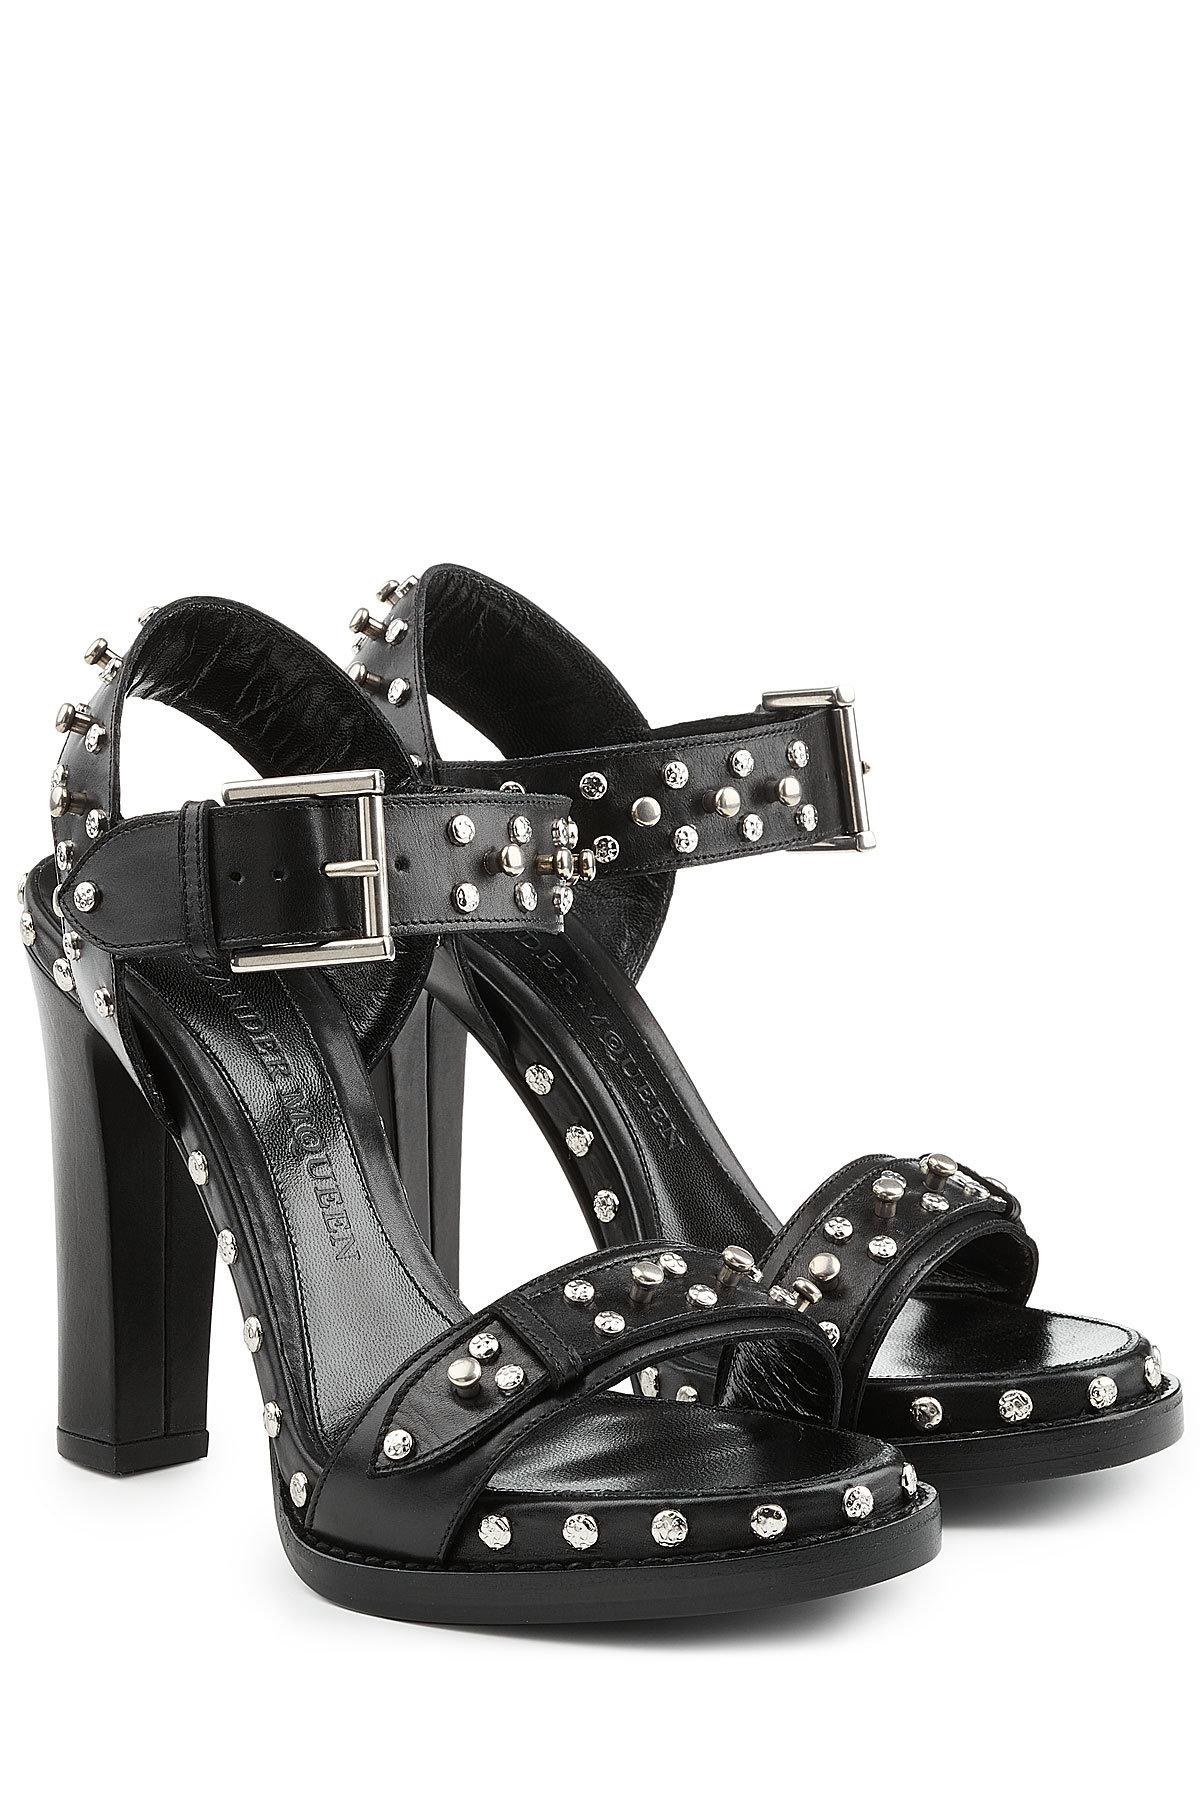 Alexander McQueen Studded Leather Sandal Heels Gr. IT 39 uS7dKV